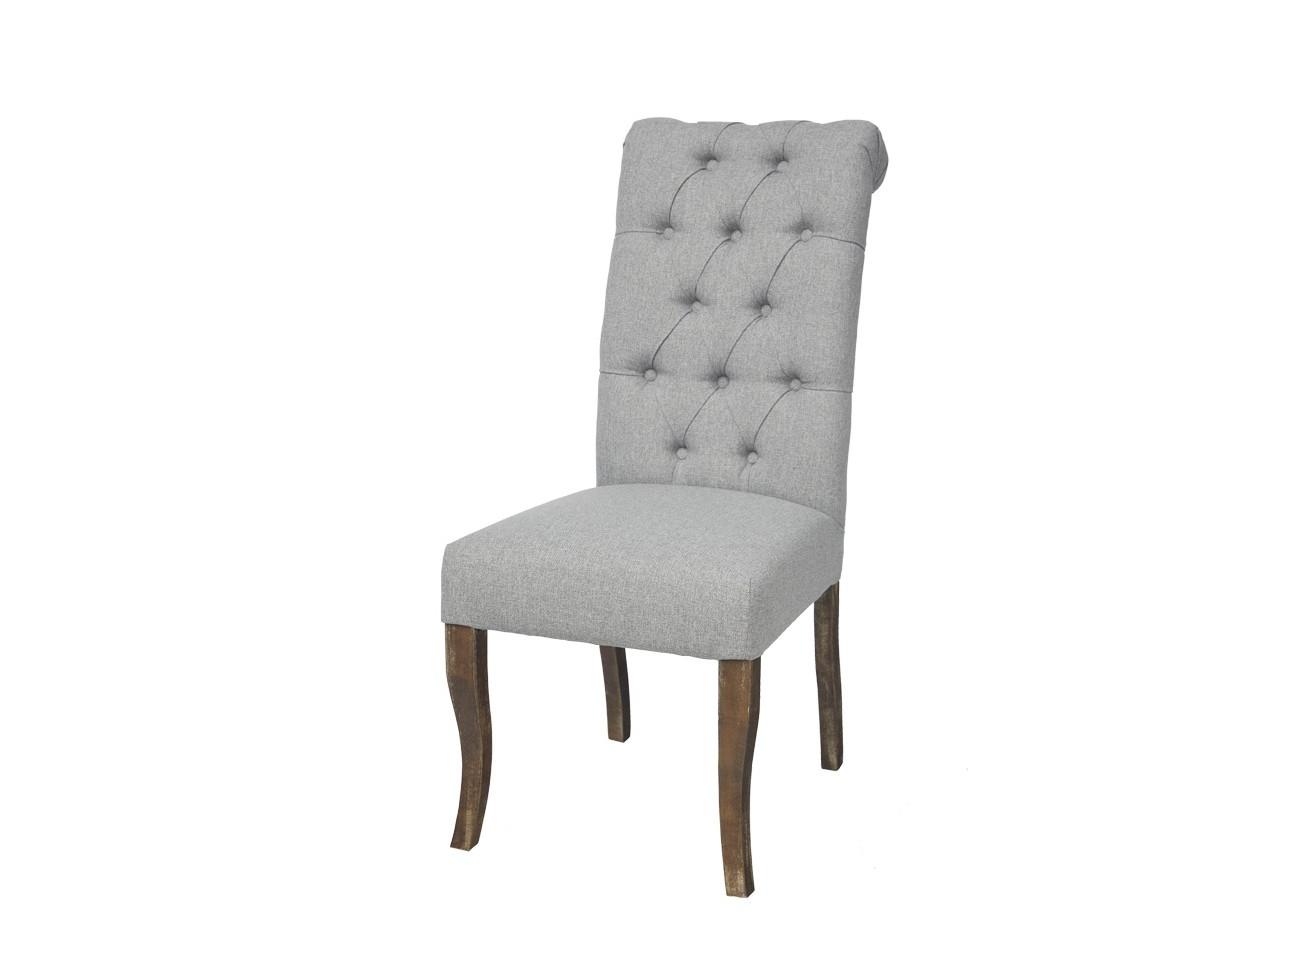 Кухонный стул Gramercy 9656828 от thefurnish